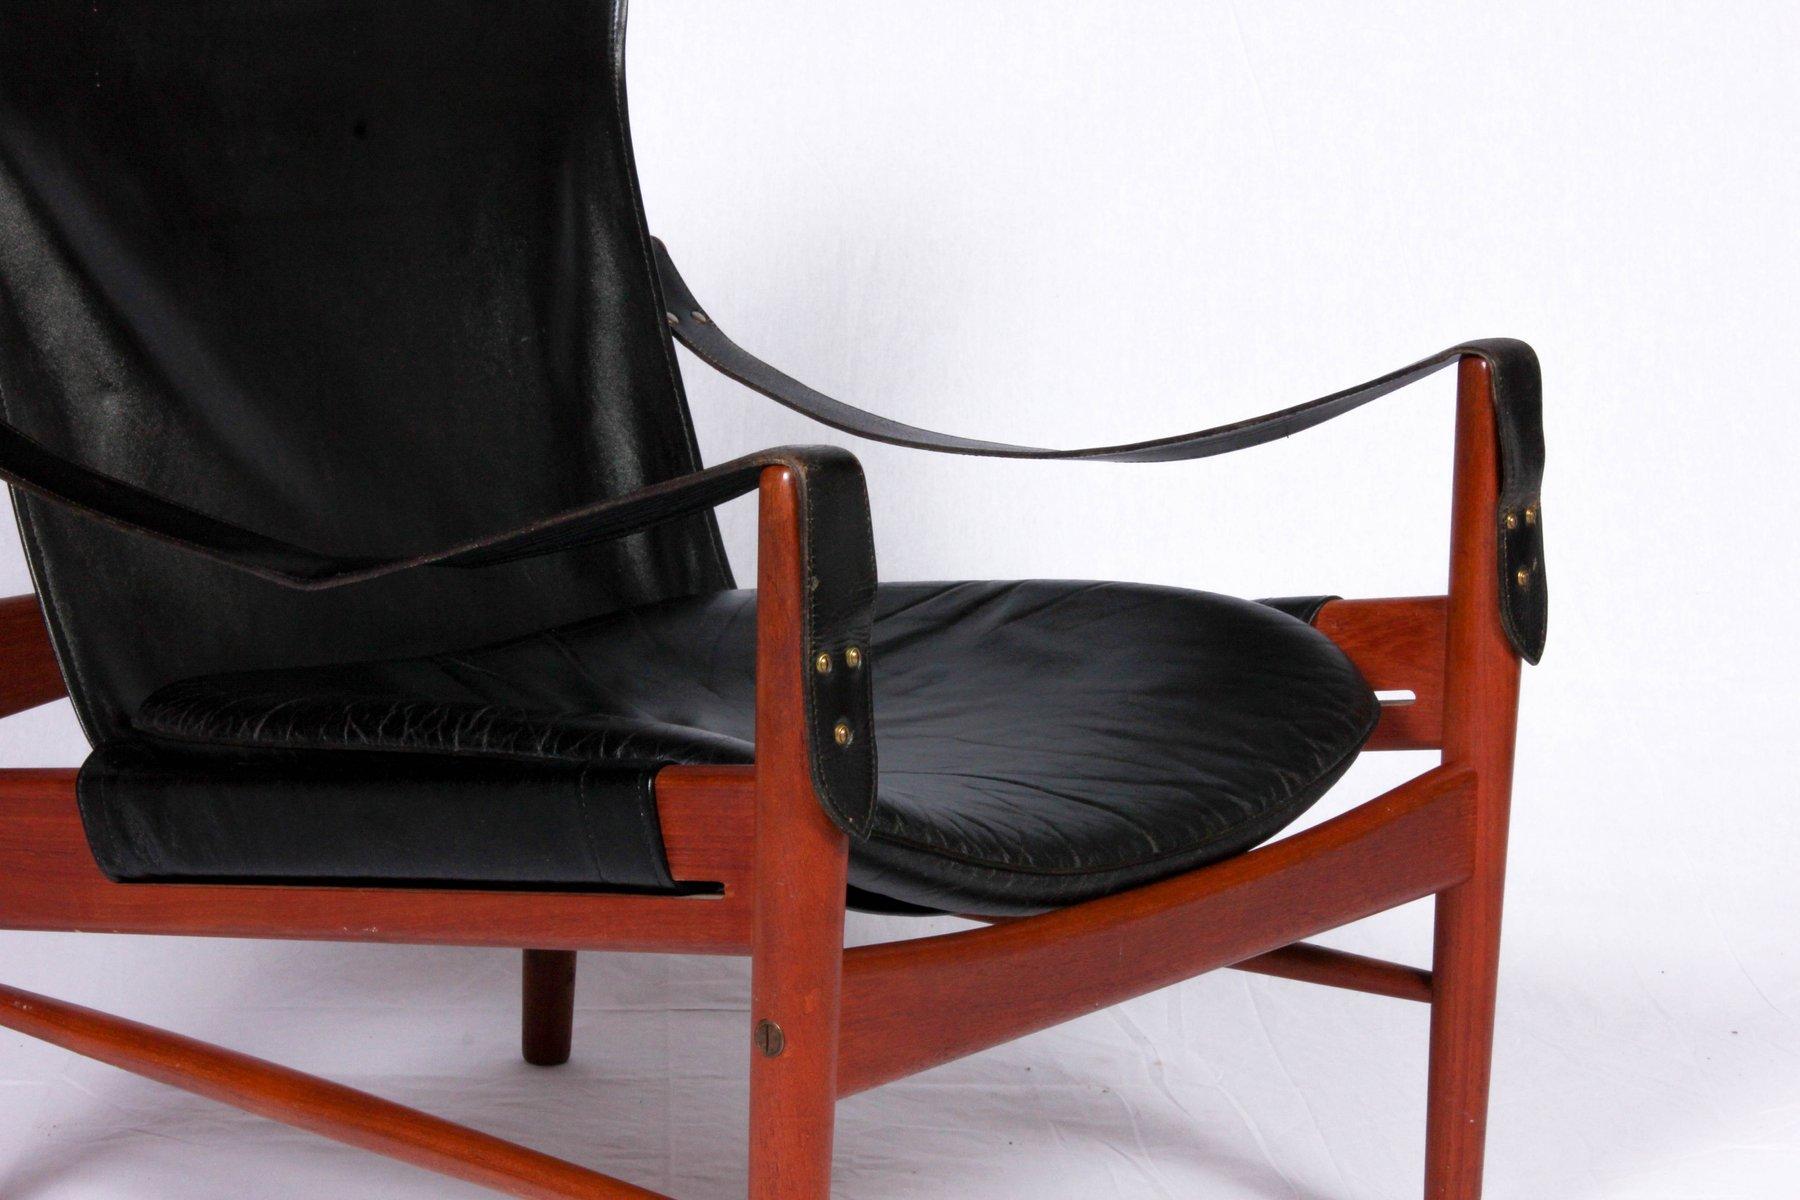 vintage antilop safari chair in black leather and teak by hans